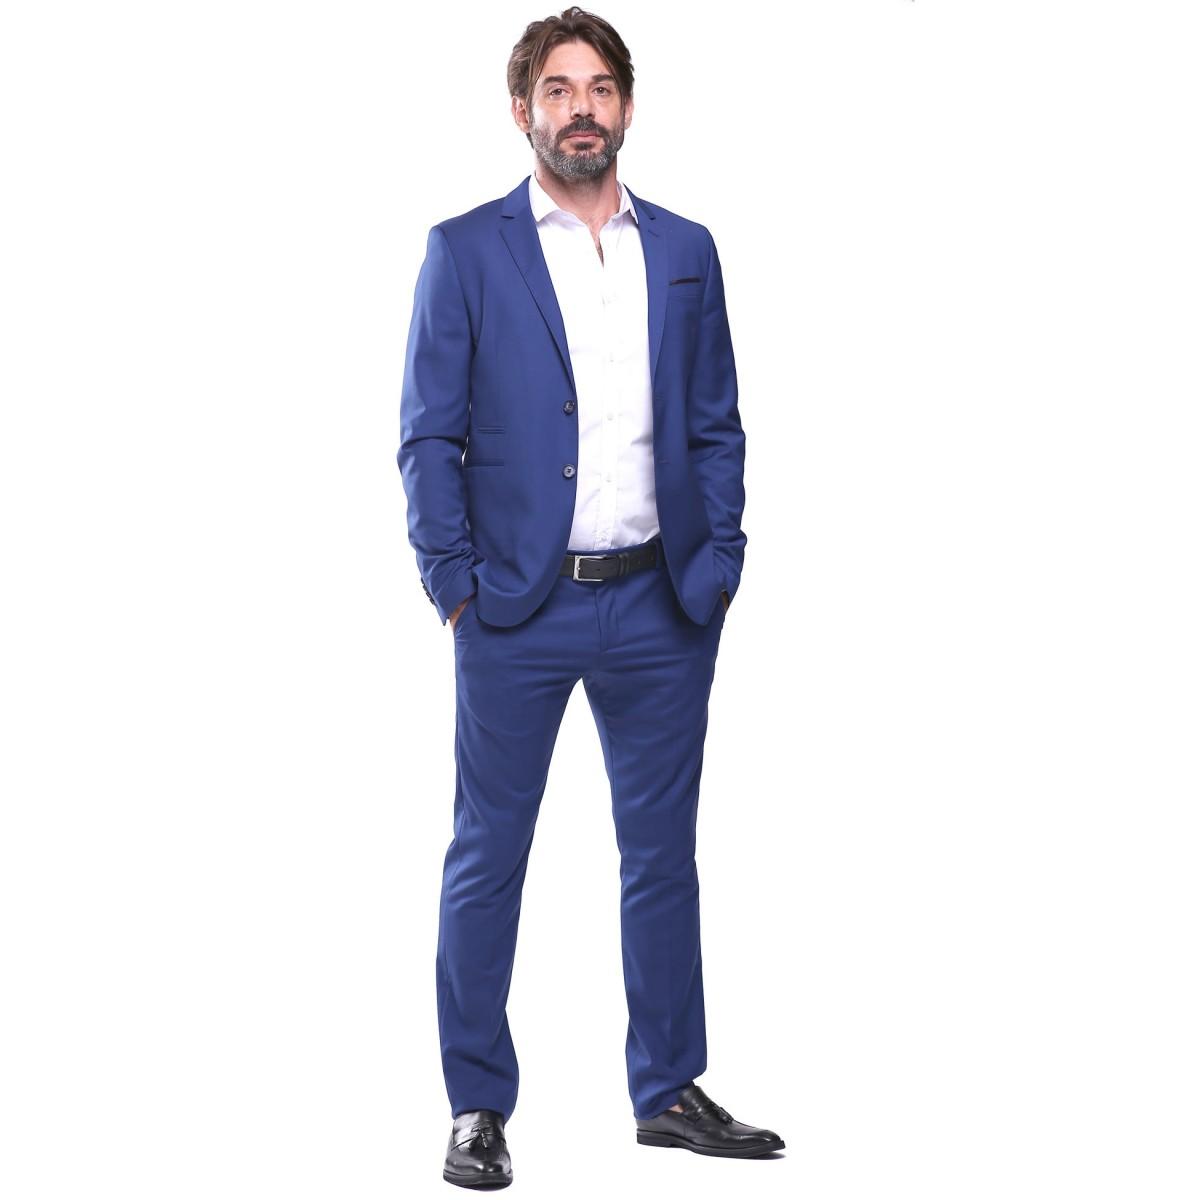 Costume Homme Hamadi Abid - Prix : 169,990 TND